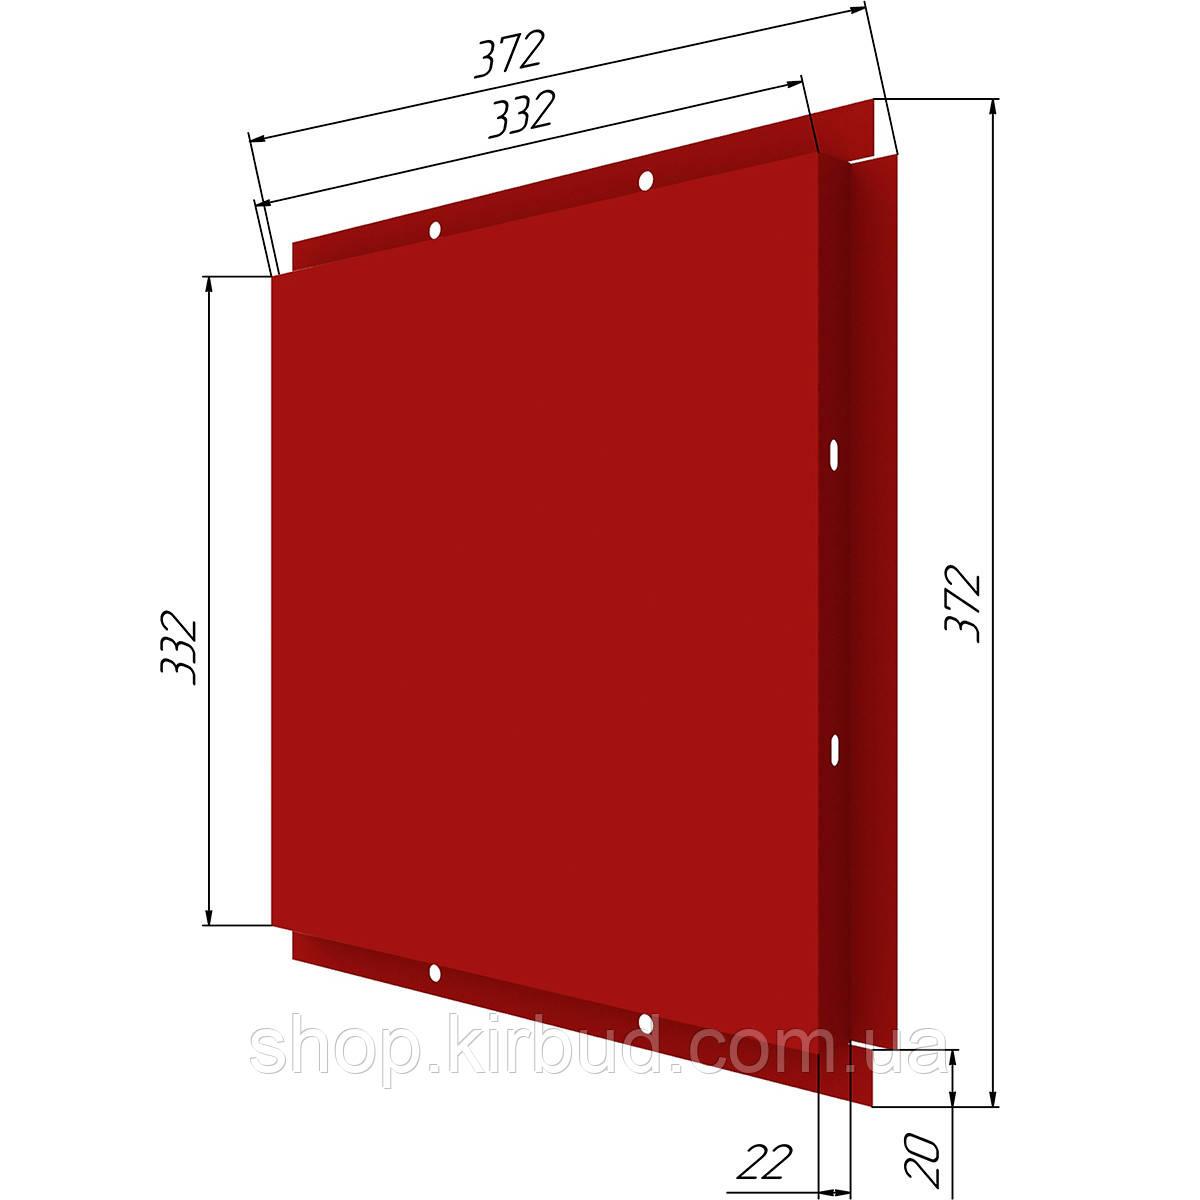 Фасадные касети (под заказ) оцинкованые 0,45мм 372х372мм